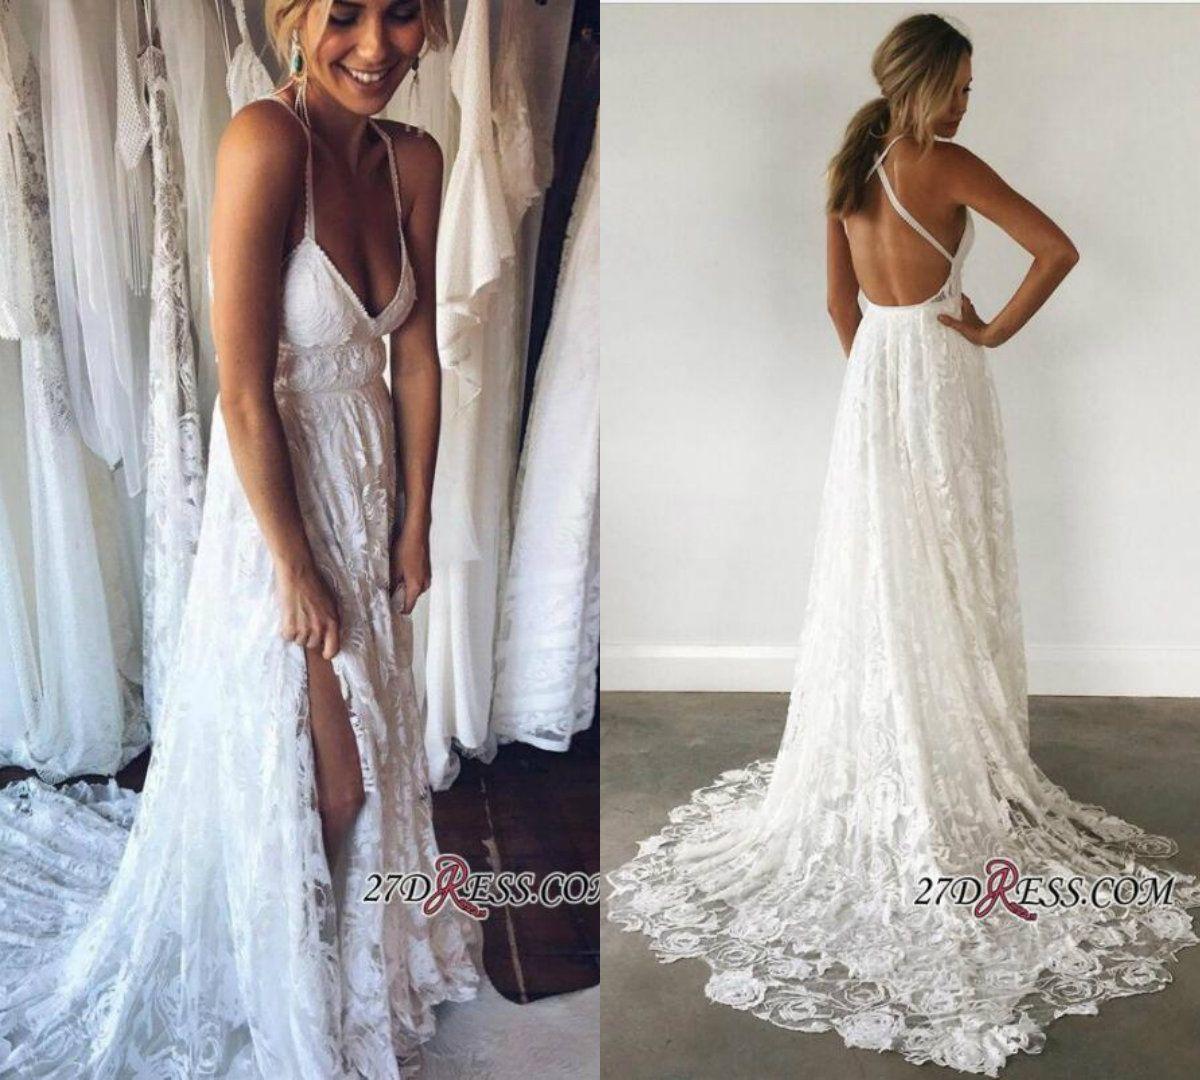 d693fce5590a4 Discount 2018 A Line Beach Bohemian Wedding Dresses Spaghetti Strap Side  Split Sexy Backless Boho Wedding Gowns Appliques Lace Bridal Dress Cheap  Long ...